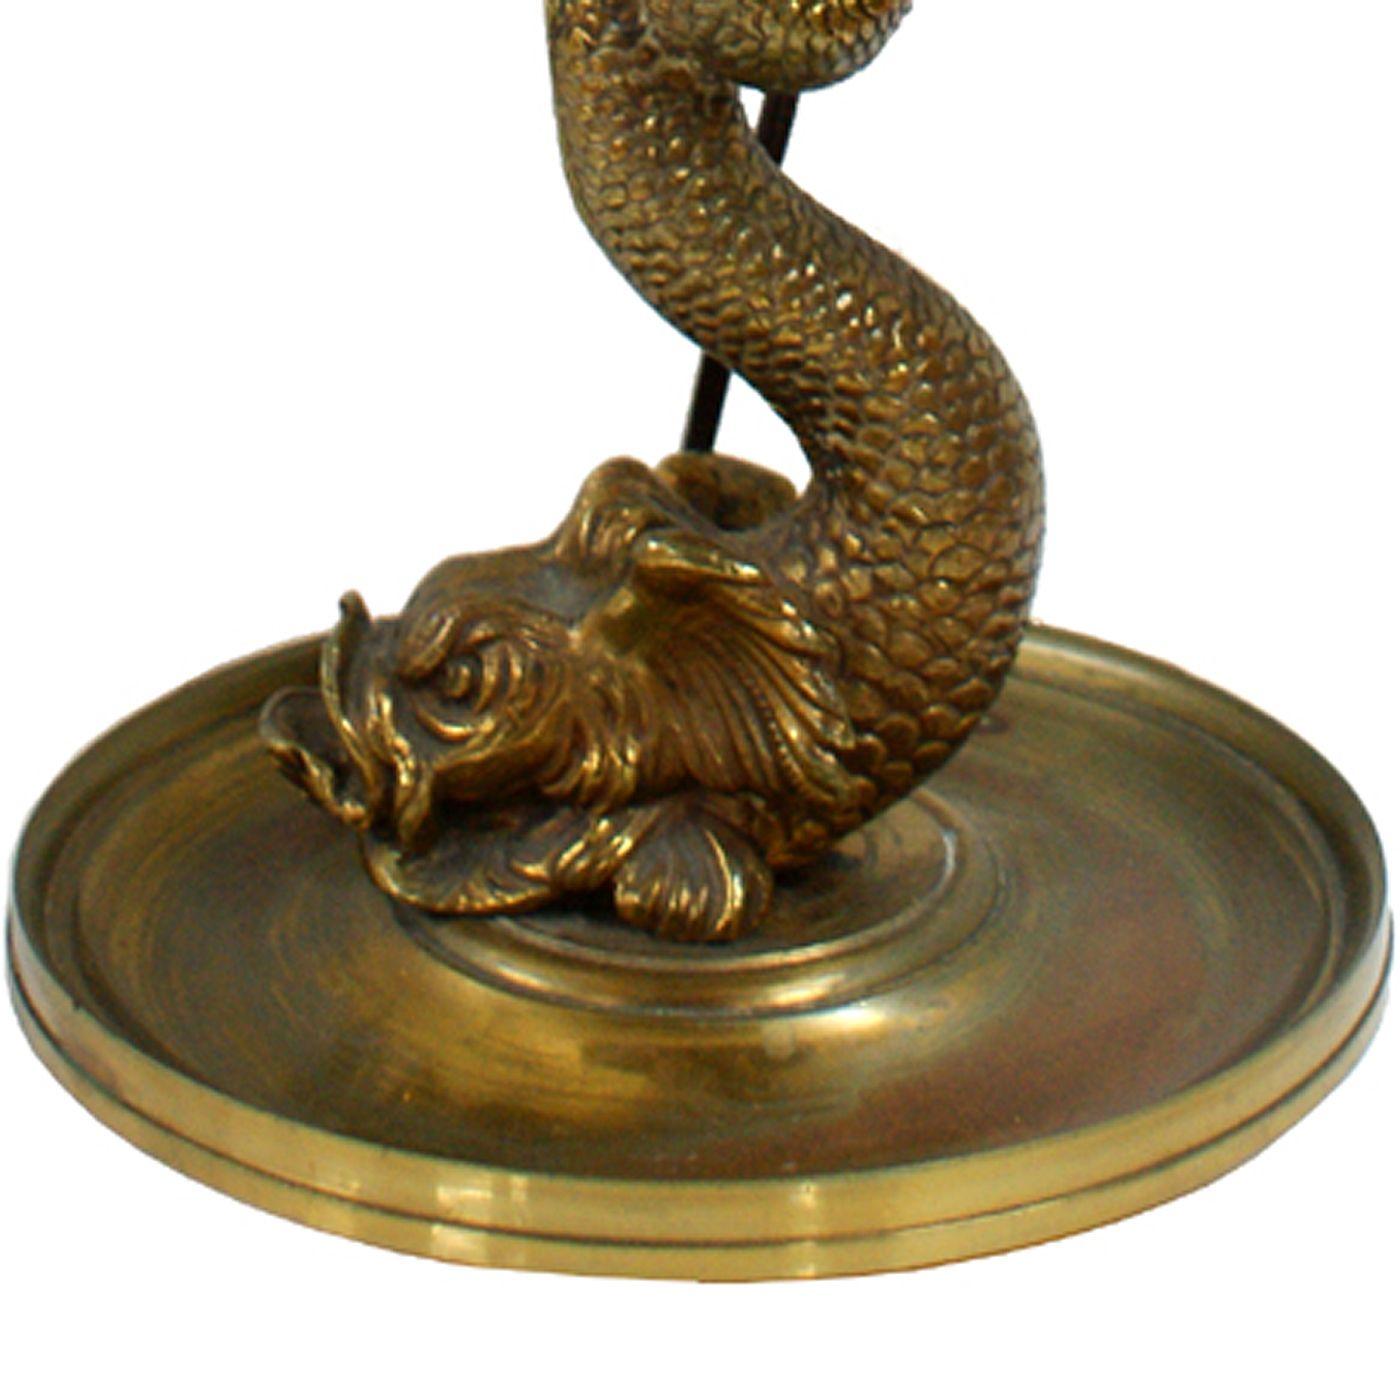 Vintage Brass Koi Fish Table or Desk Lamp